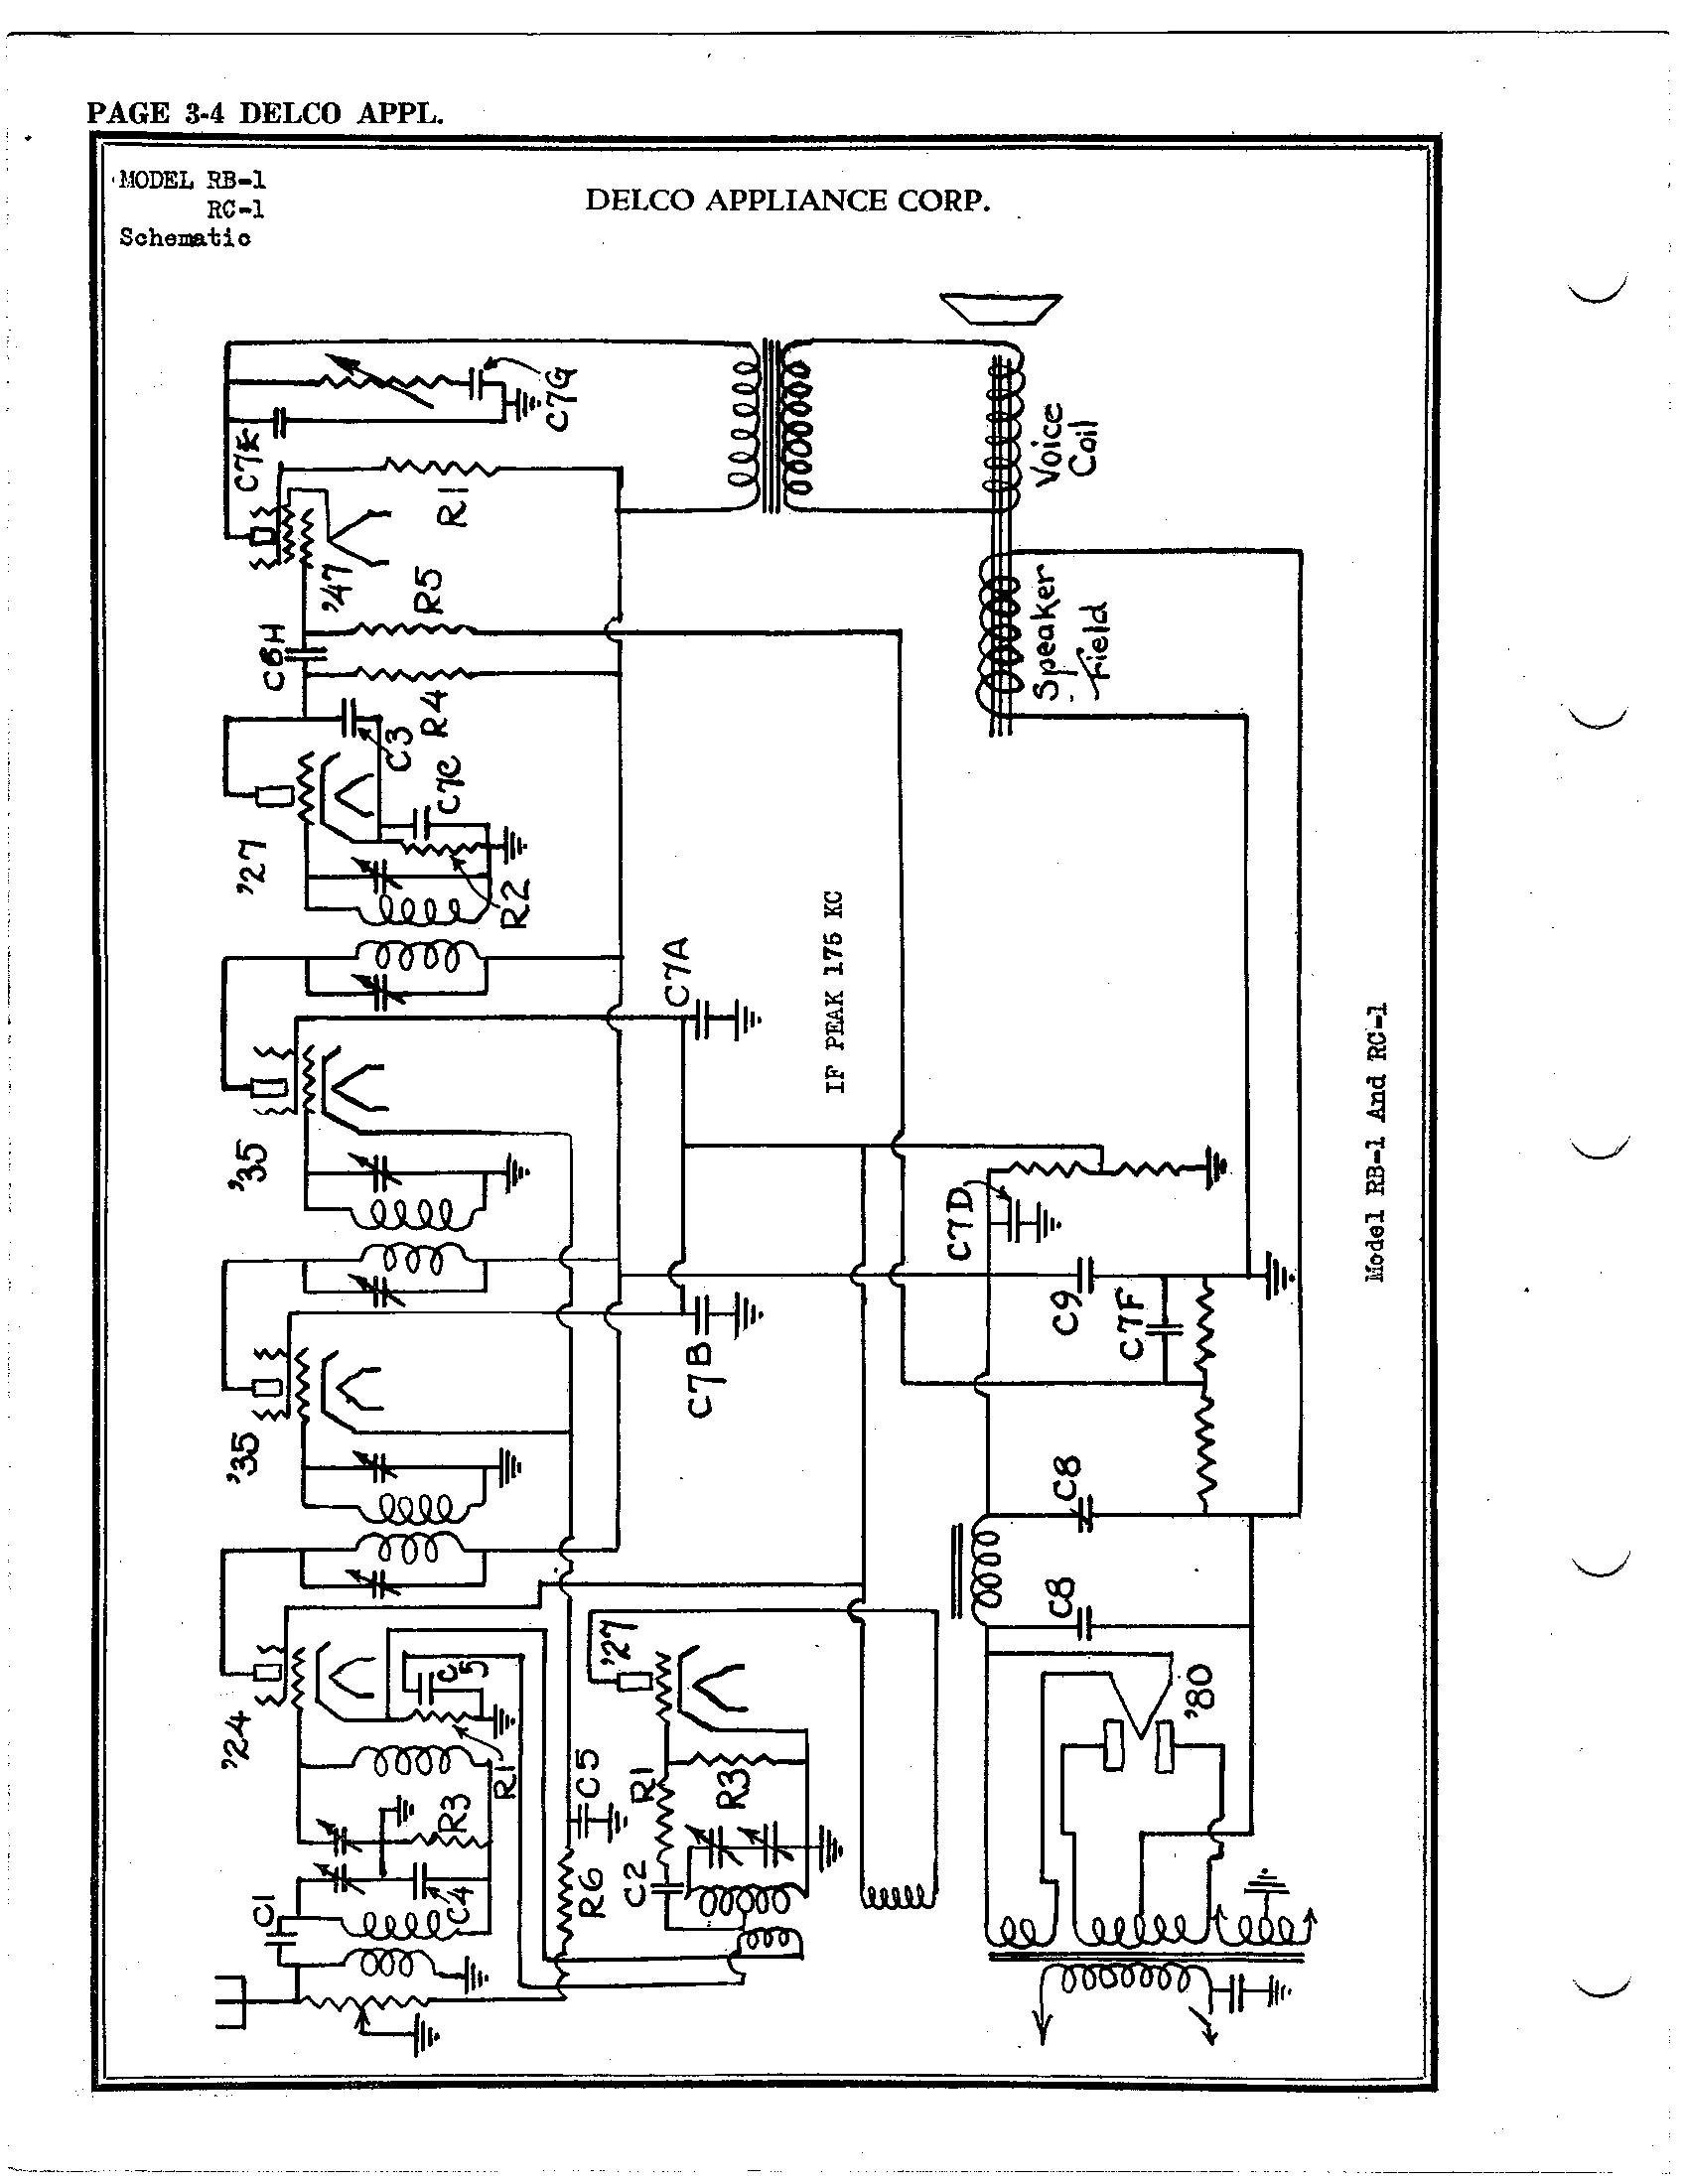 hight resolution of delco radio schematics wiring diagram show delco radio schematics wiring diagrams delphi delco radio schematics delco